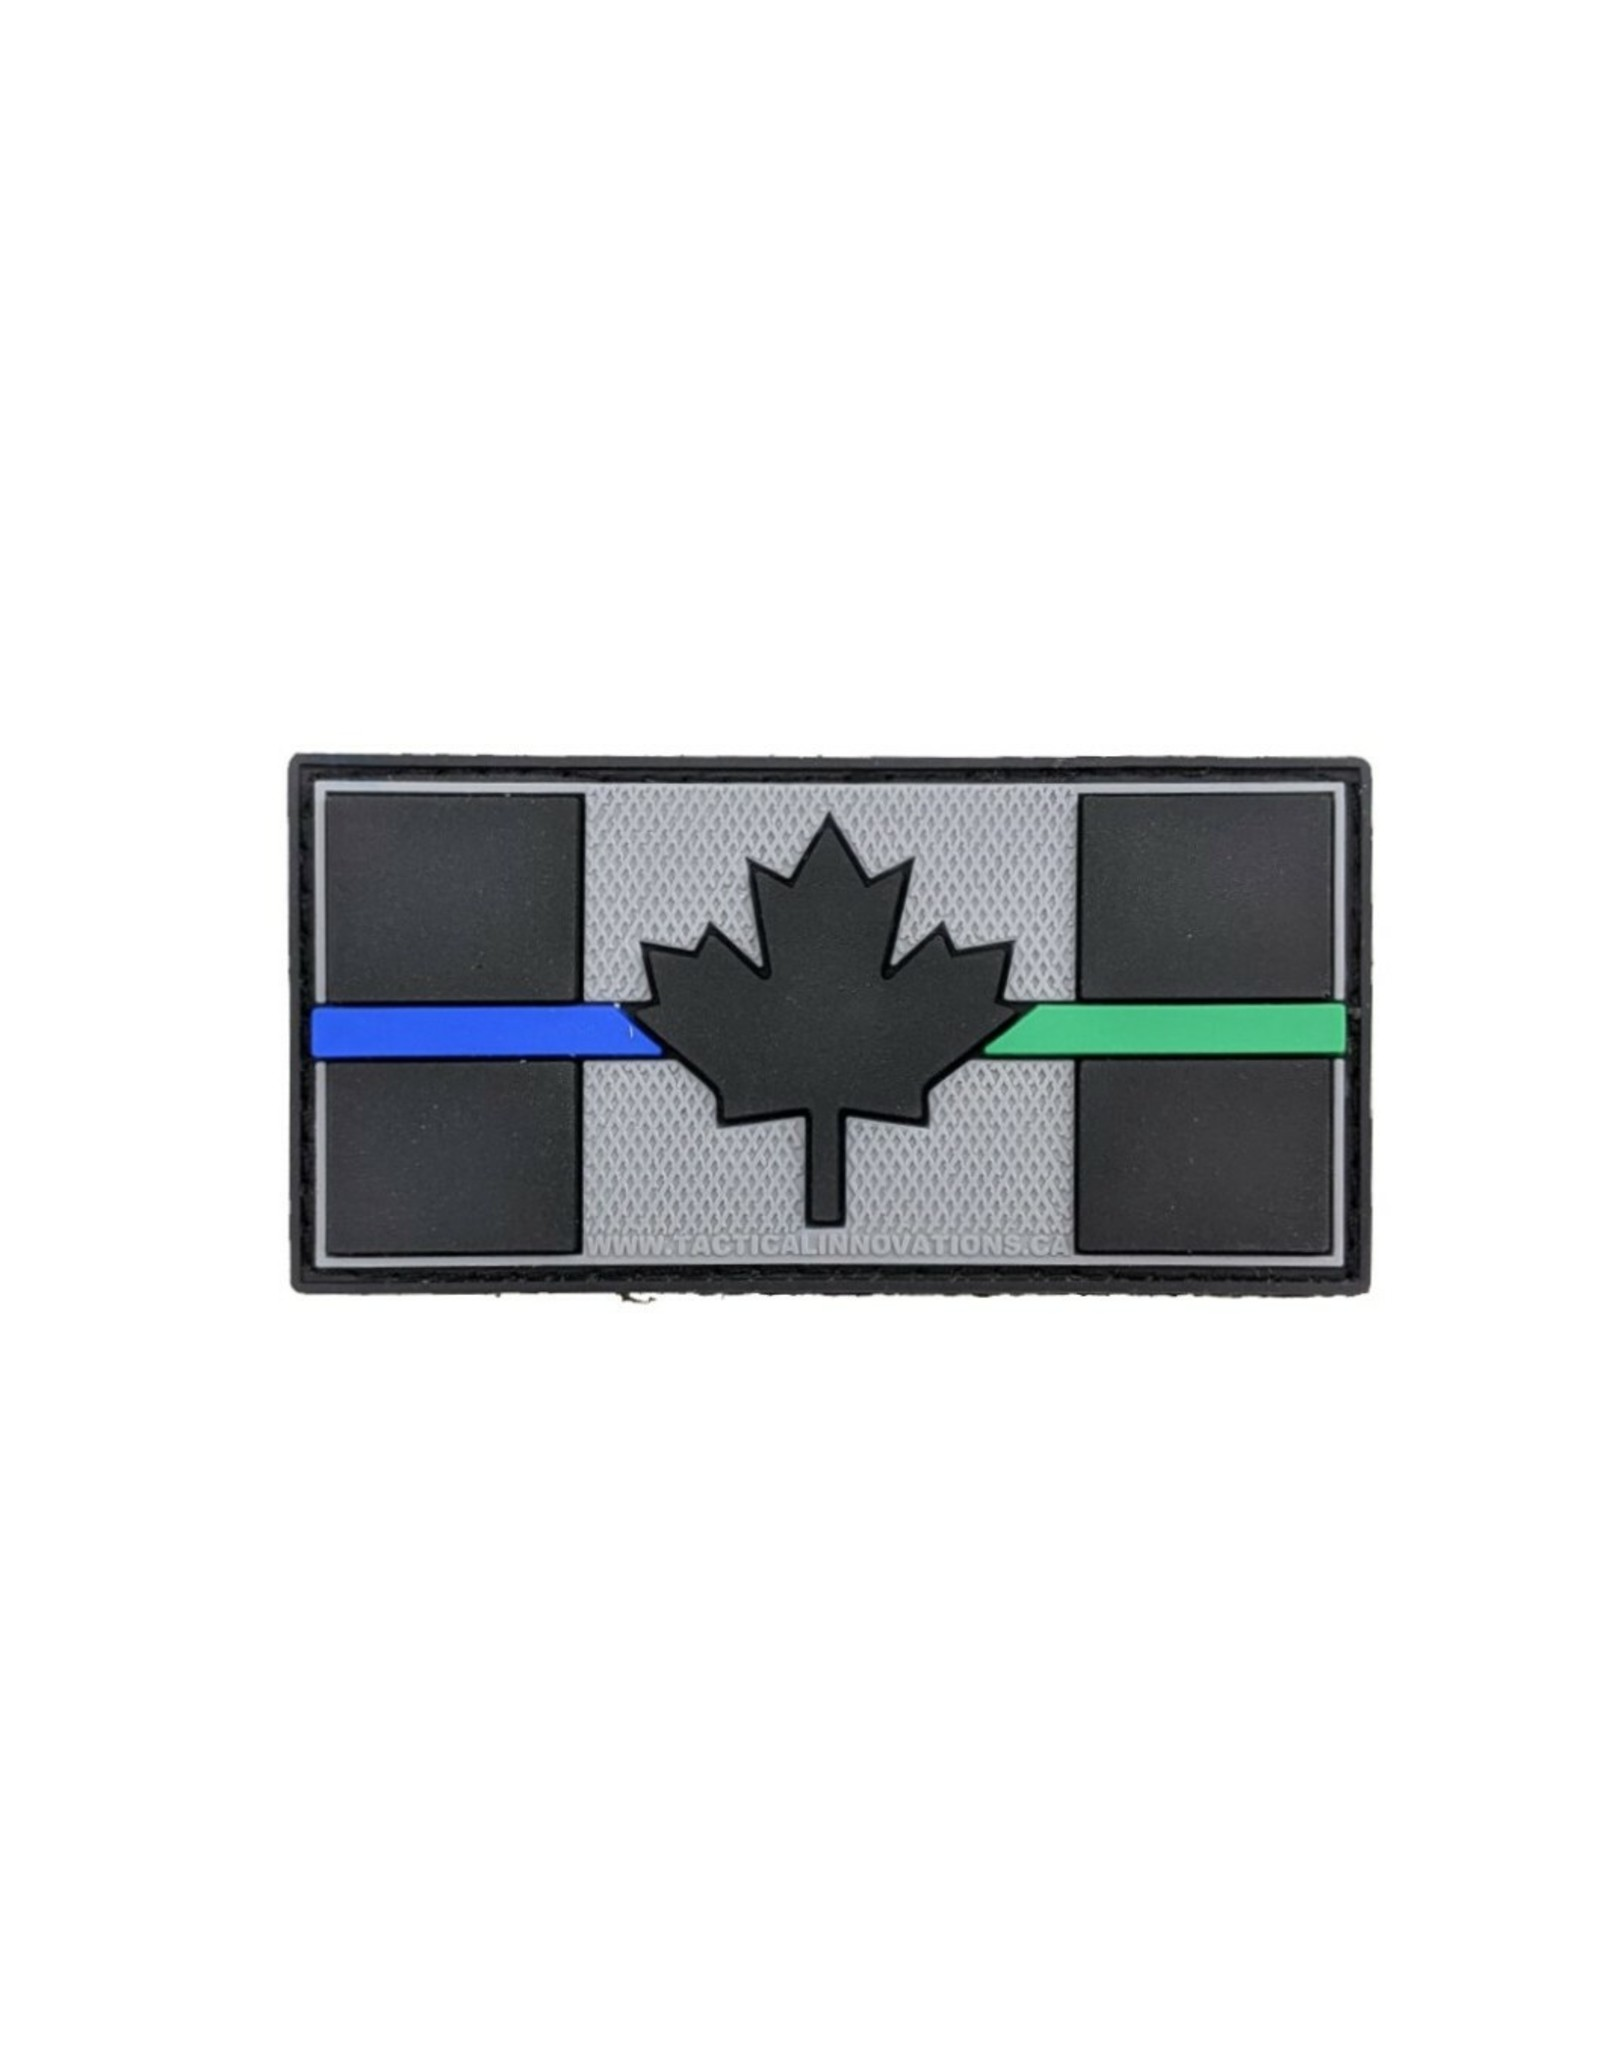 TIC Patch - THIN BLUE/GREEN LINE FLAG 1.5X3